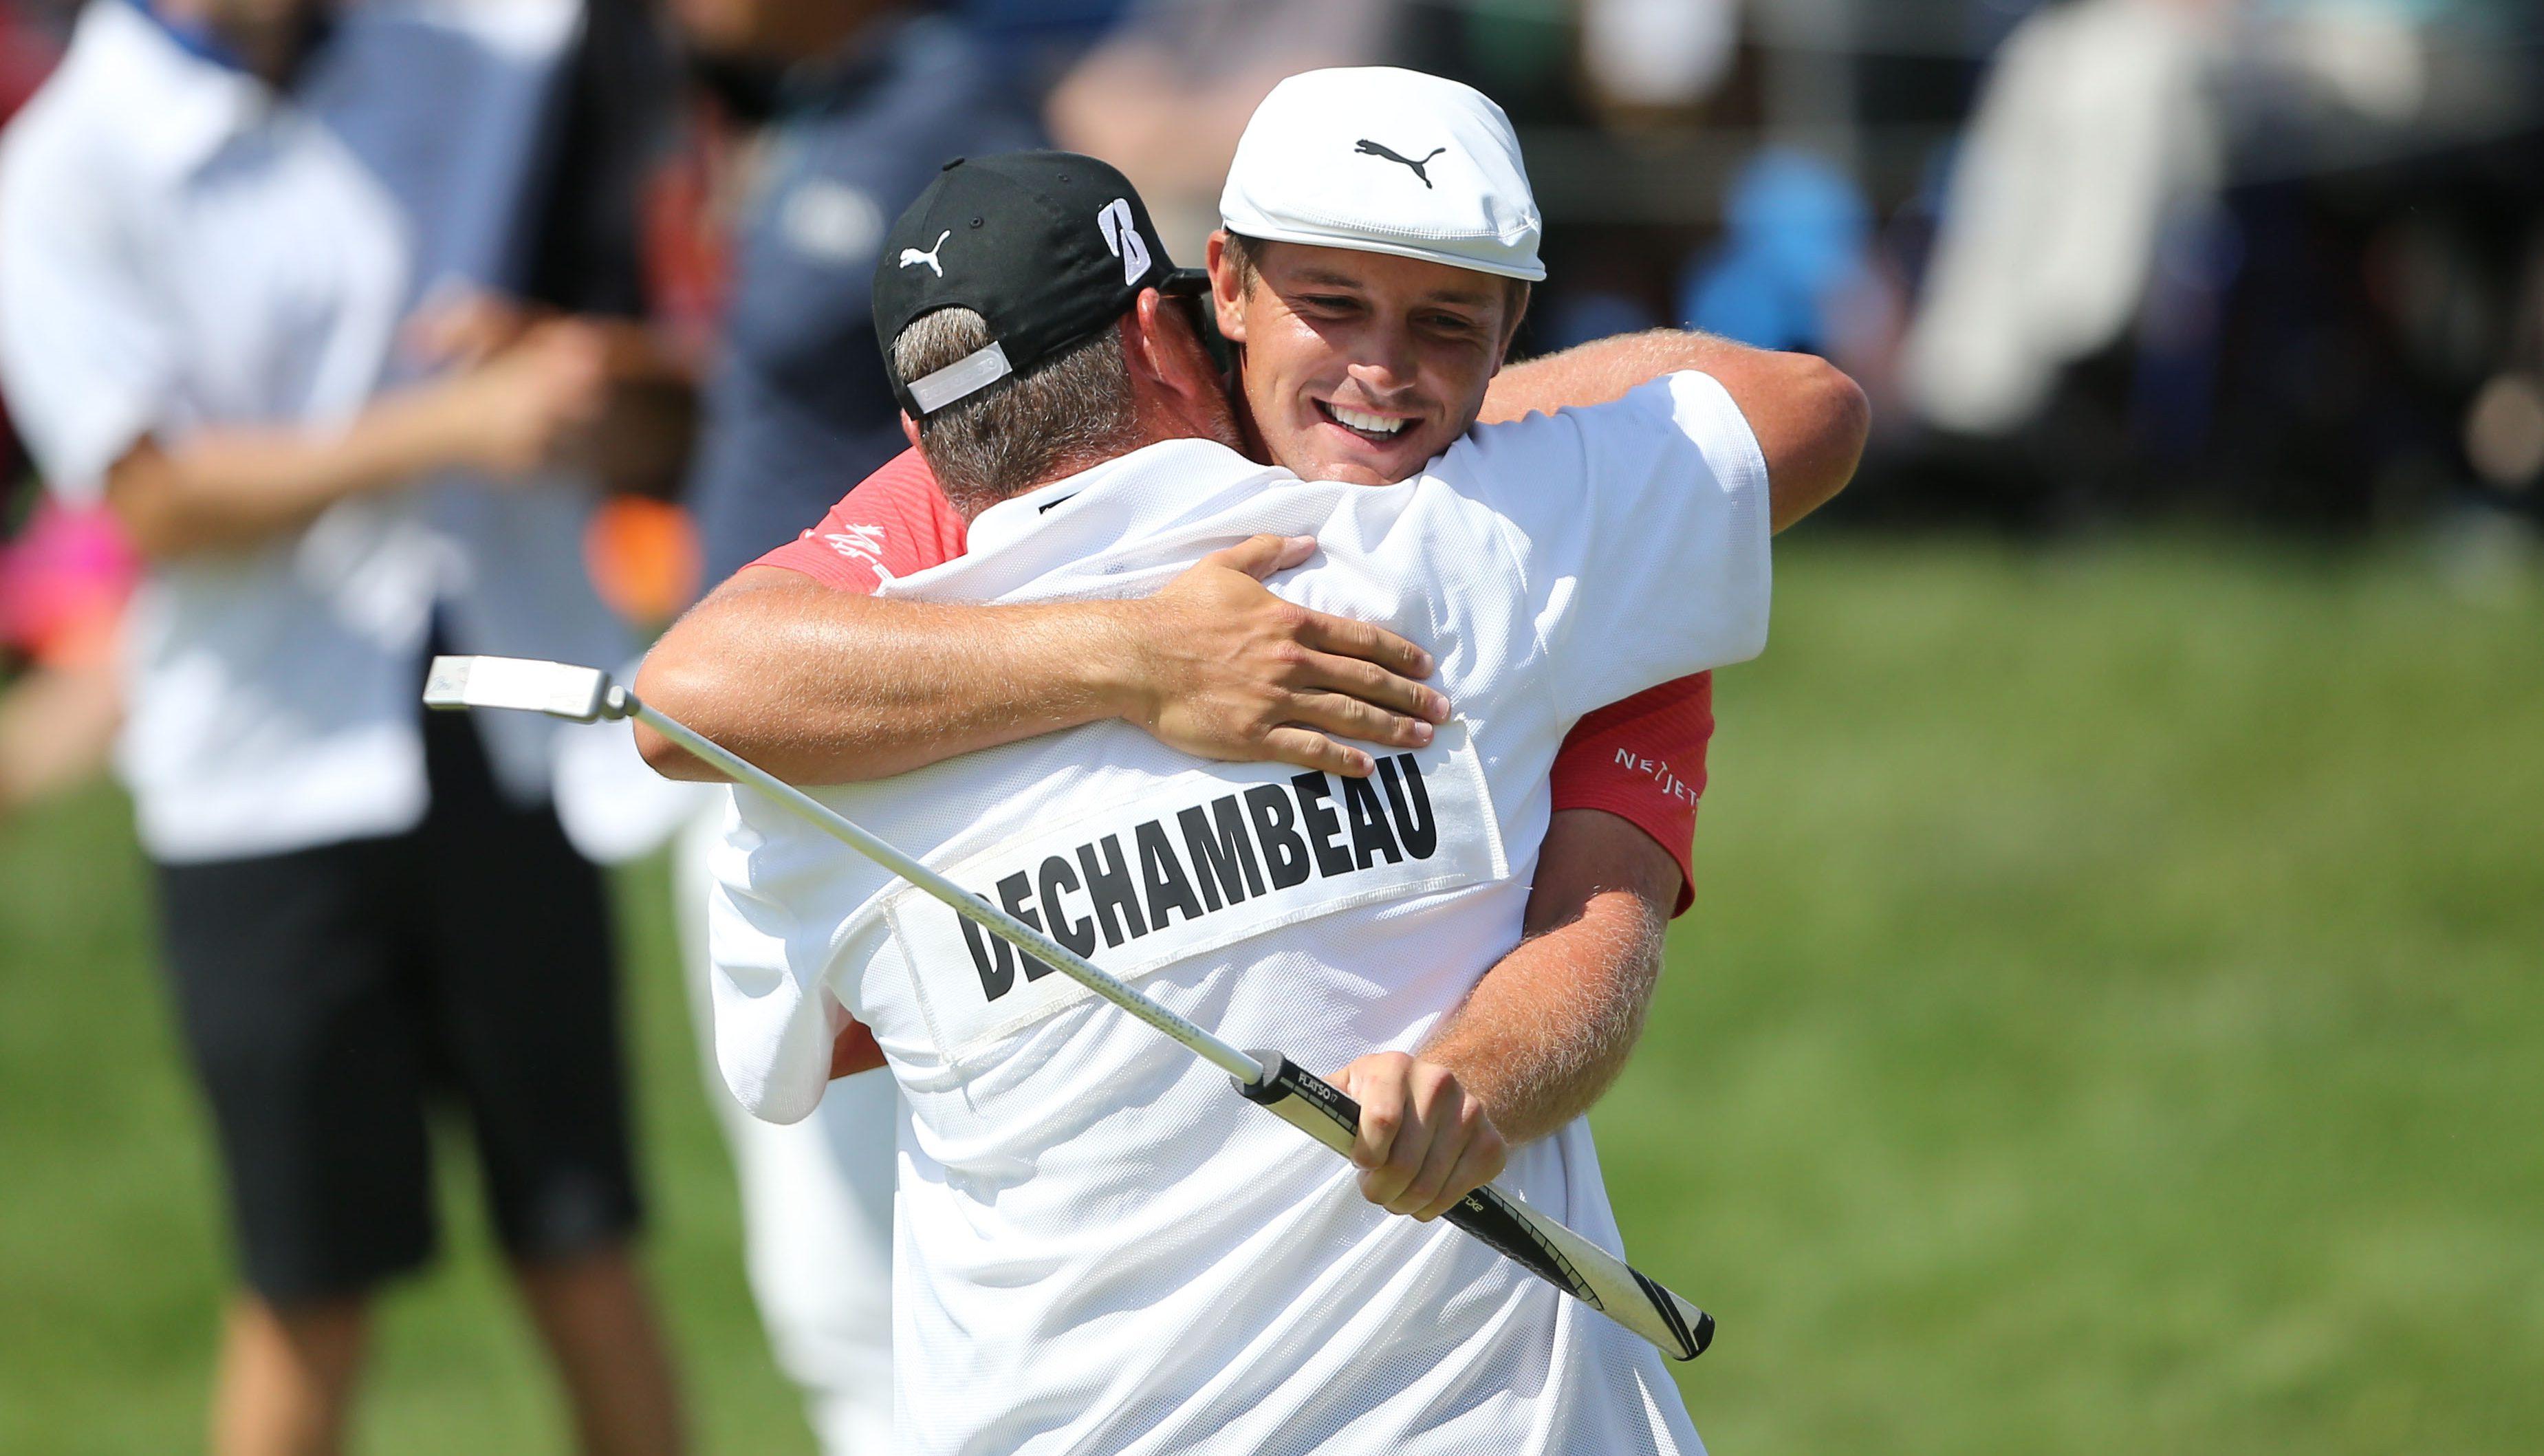 Jun 3, 2018; Dublin, OH, USA; Bryson DeChambeau celebrates with his caddie after winning The Memorial golf tournament at Muirfield Village Golf Club. Mandatory Credit: Joe Maiorana-USA TODAY Sports